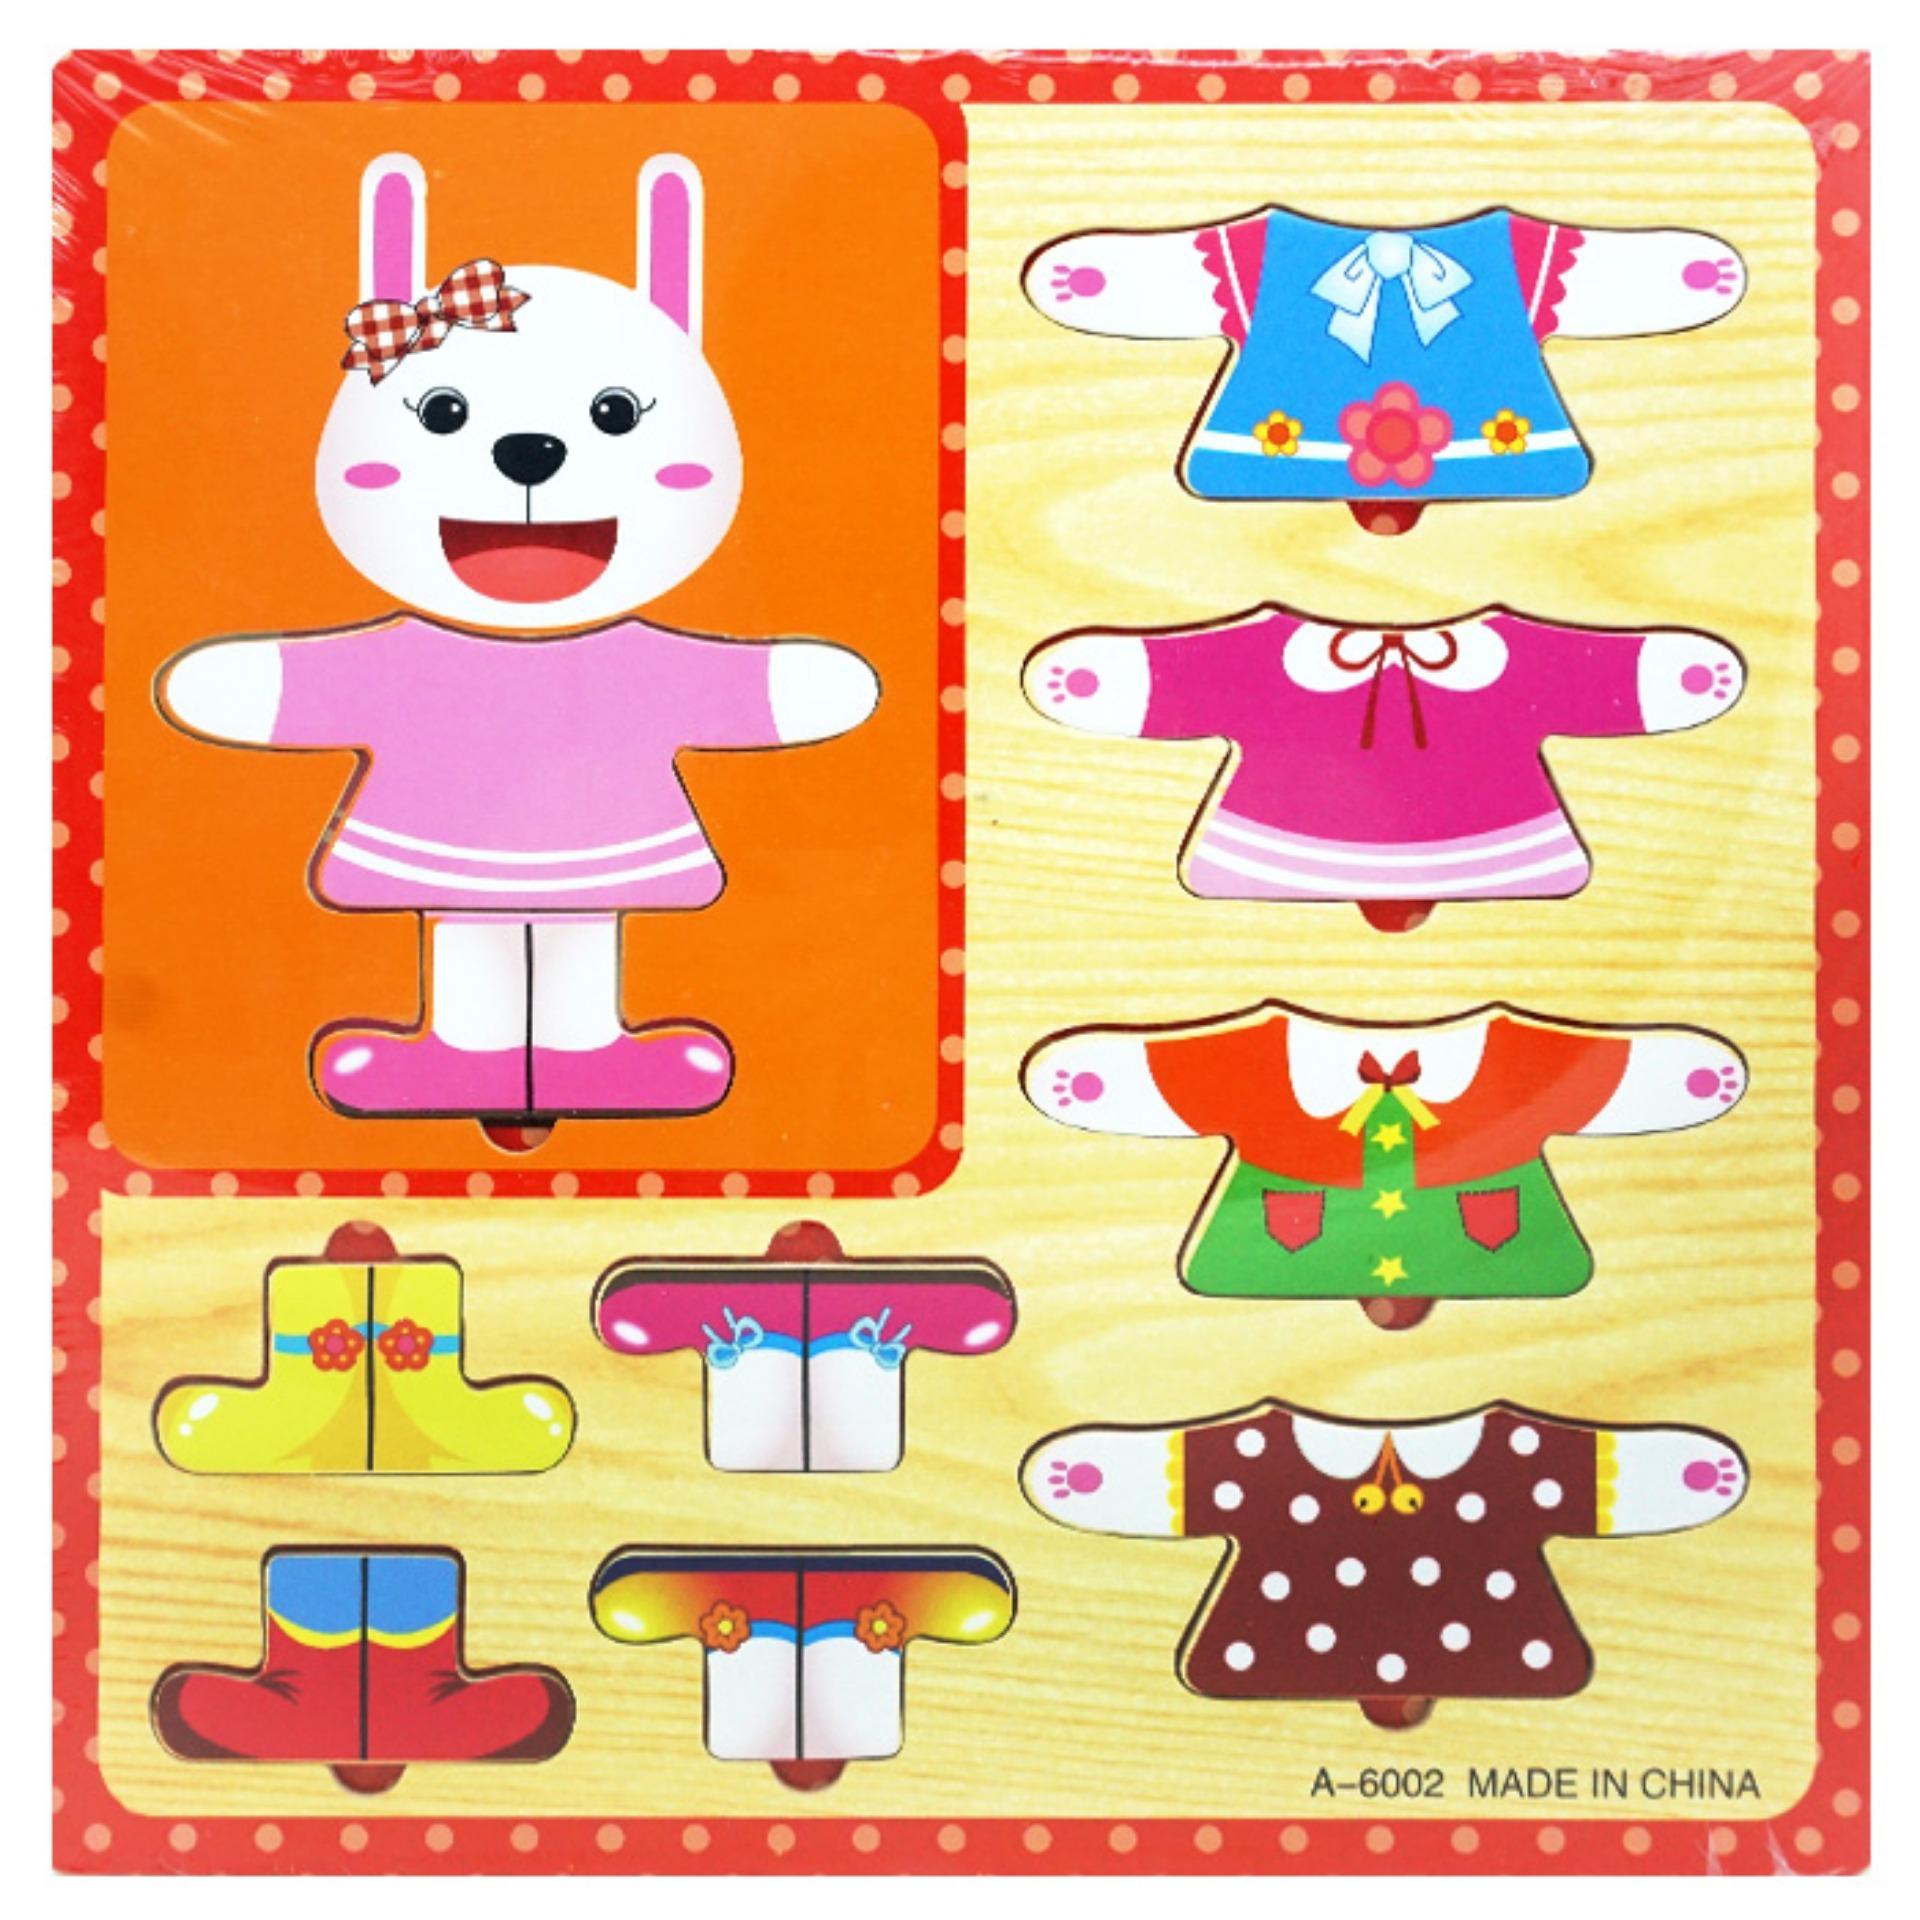 ... TSH Mainan Edukasi Puzzle Hewan Cewe Ganti Baju 3D Jigsaw kayu Multi Colour